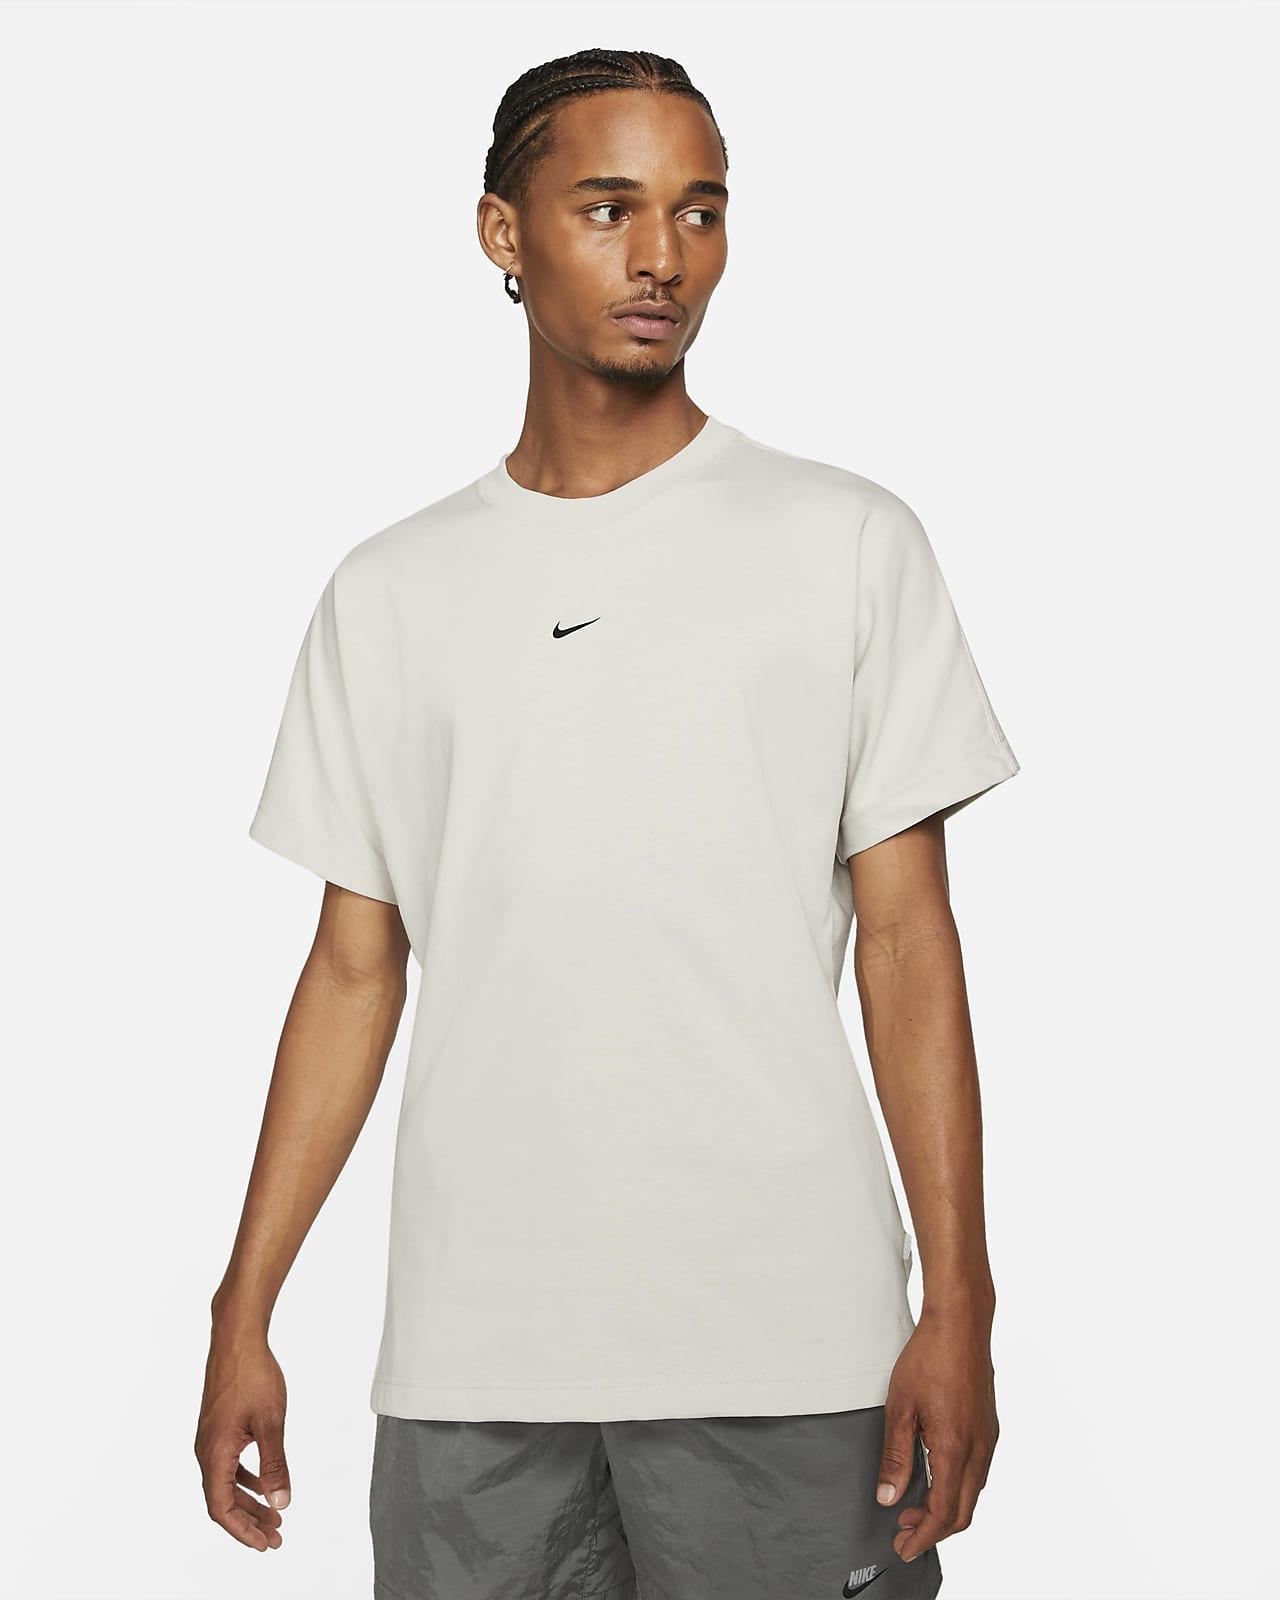 Playera de manga corta estampada para hombre Nike Sportswear Style Essentials